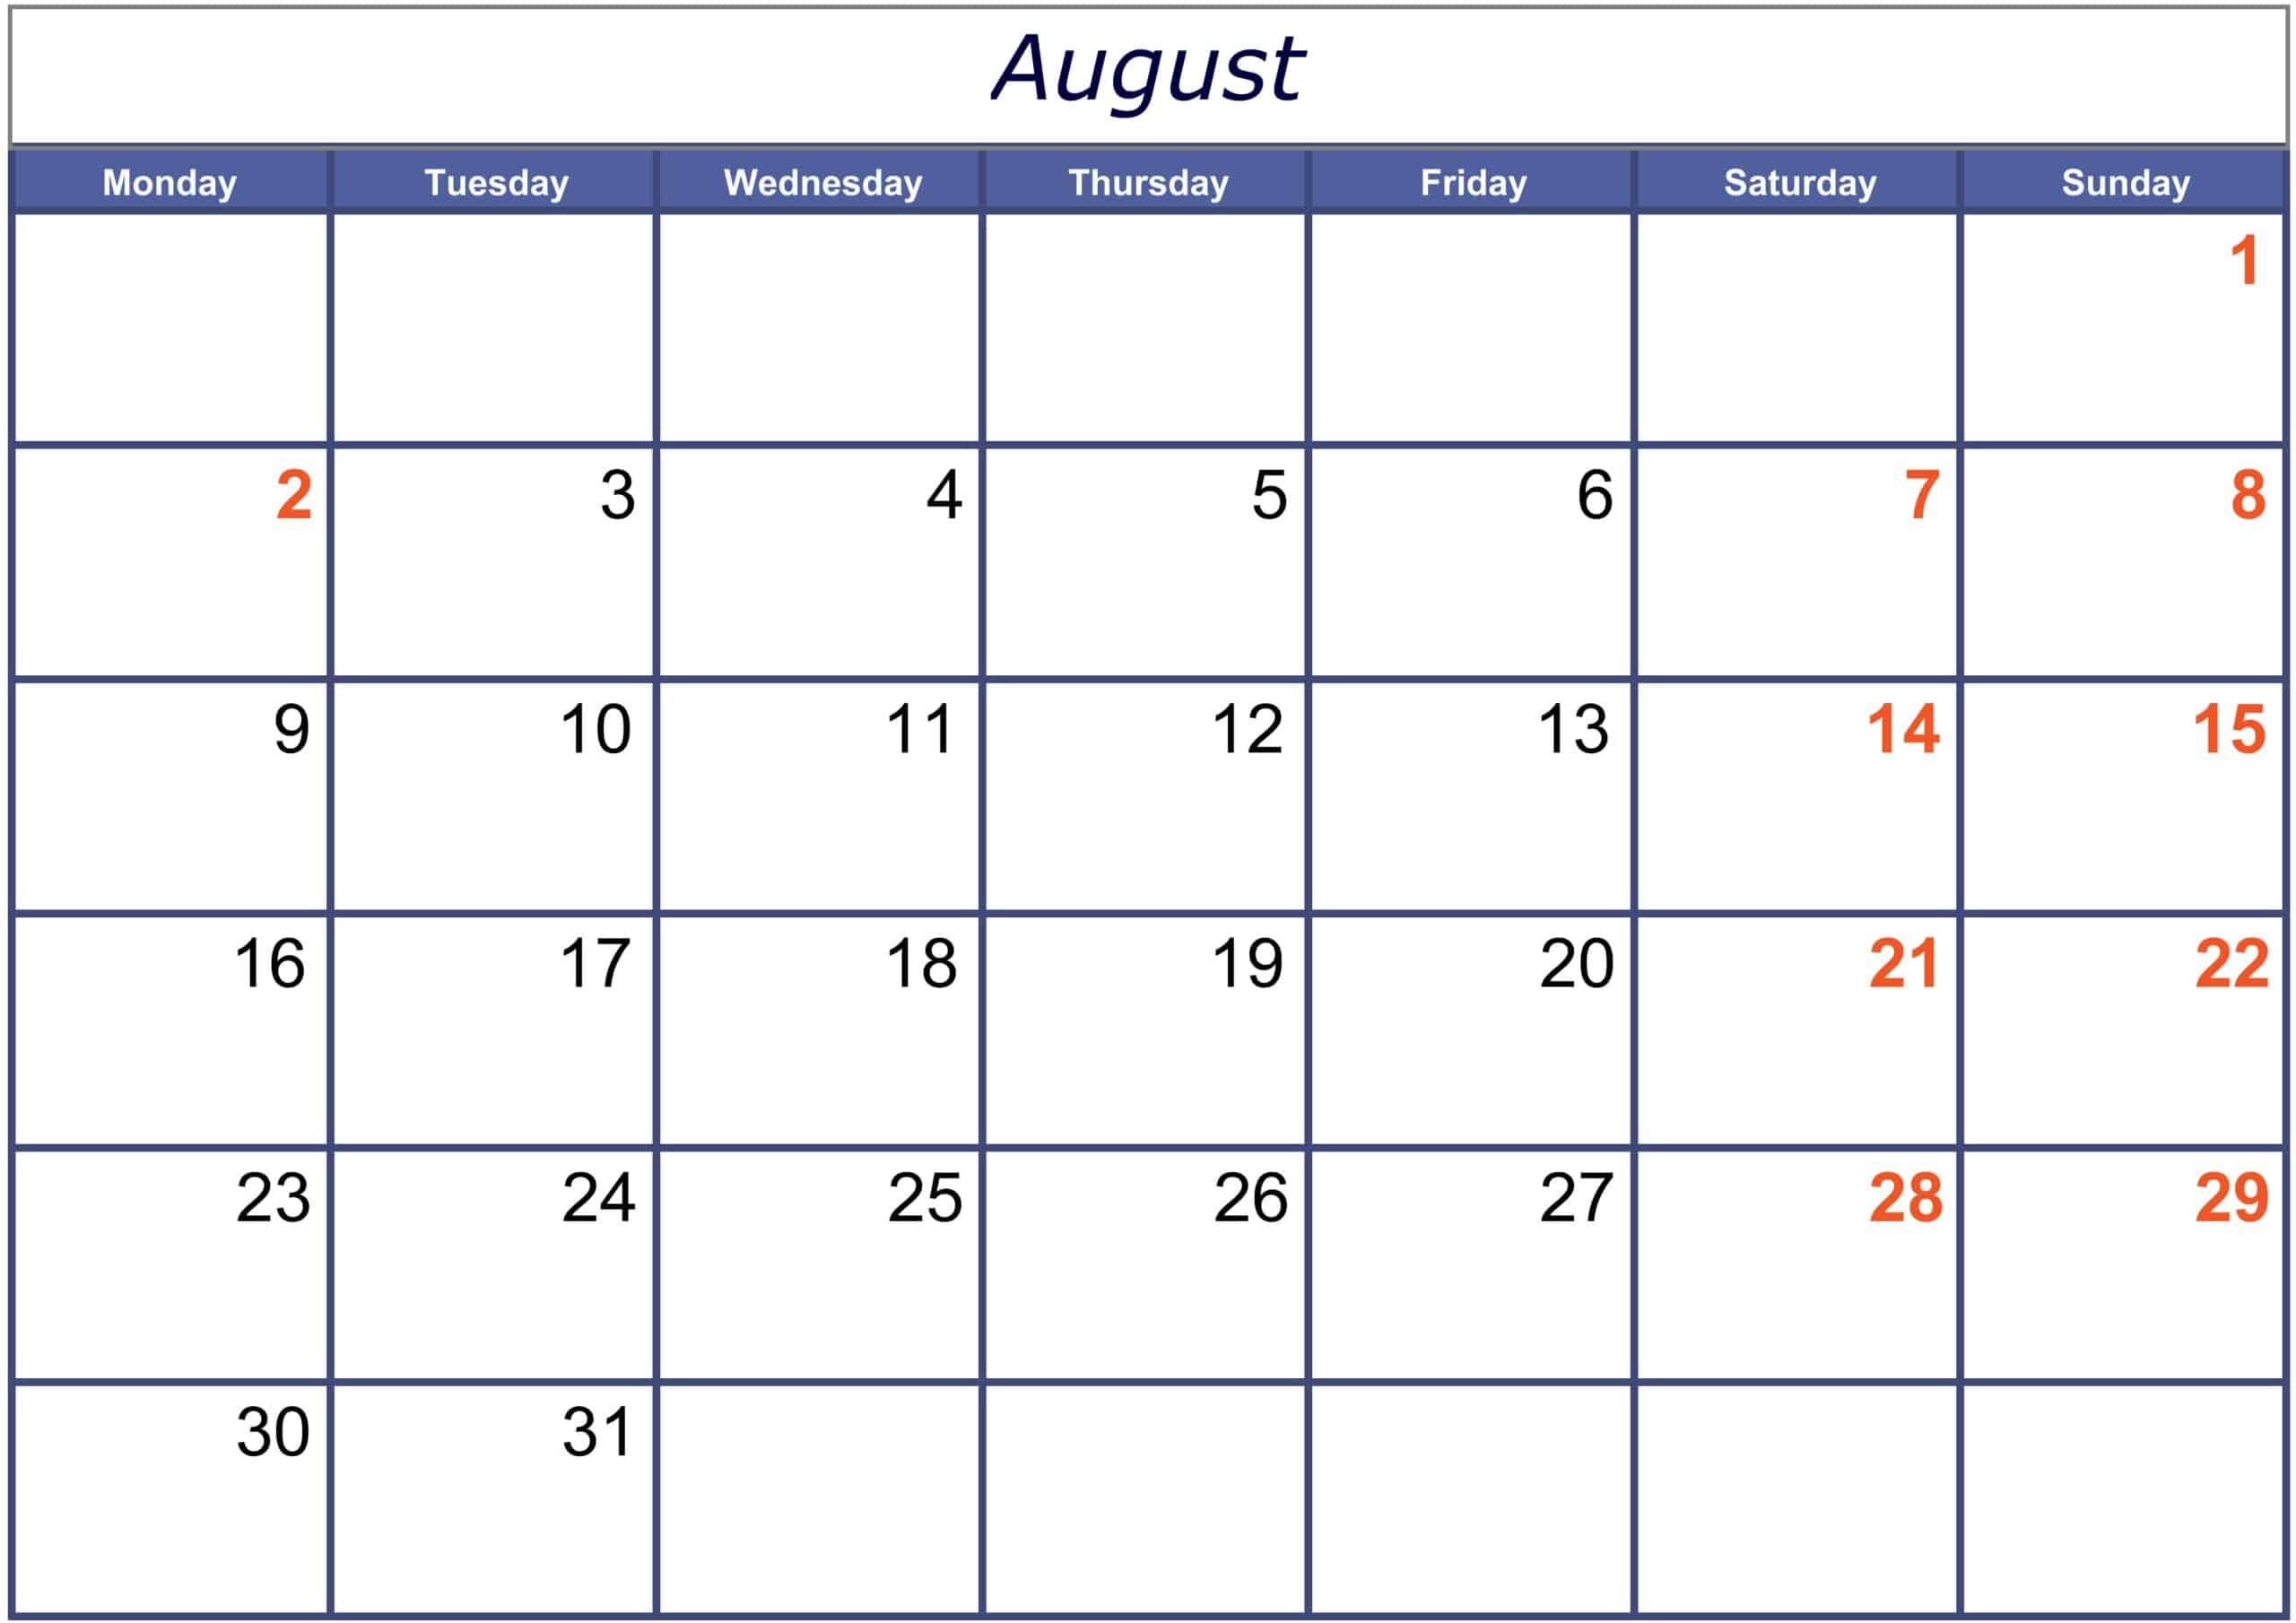 Excel August 2021 Calendar